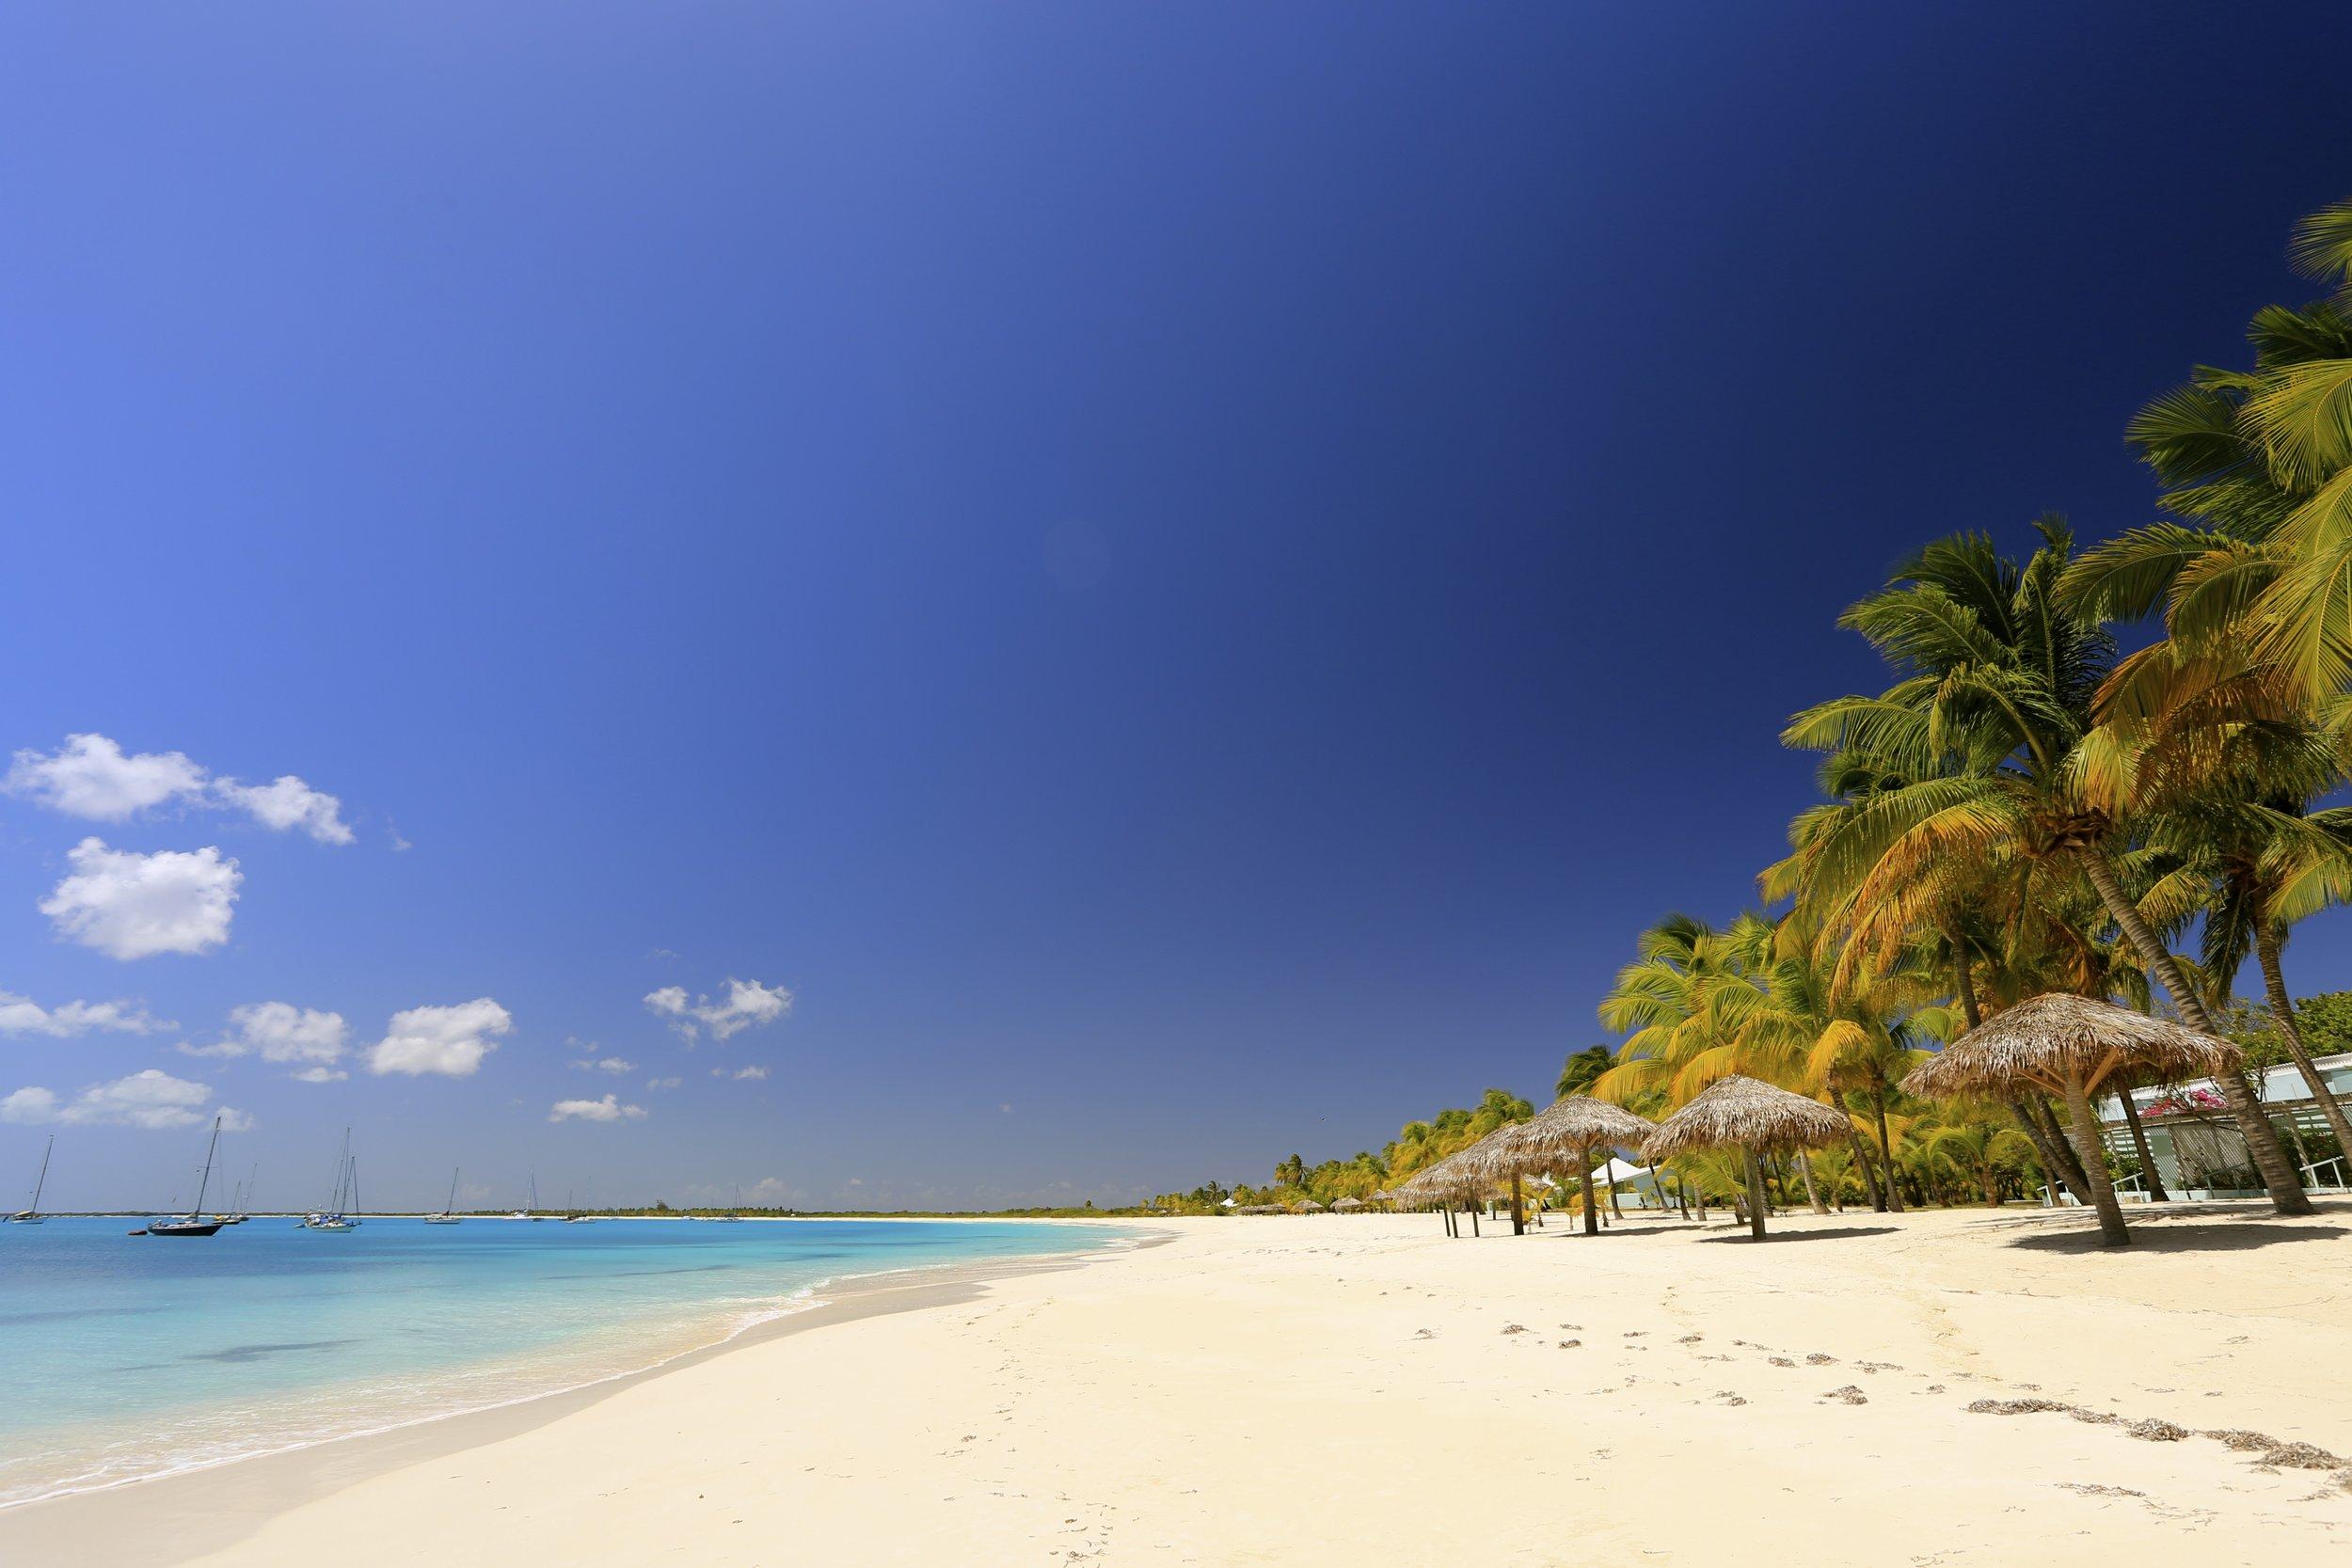 Beach Barbuda copy.jpg